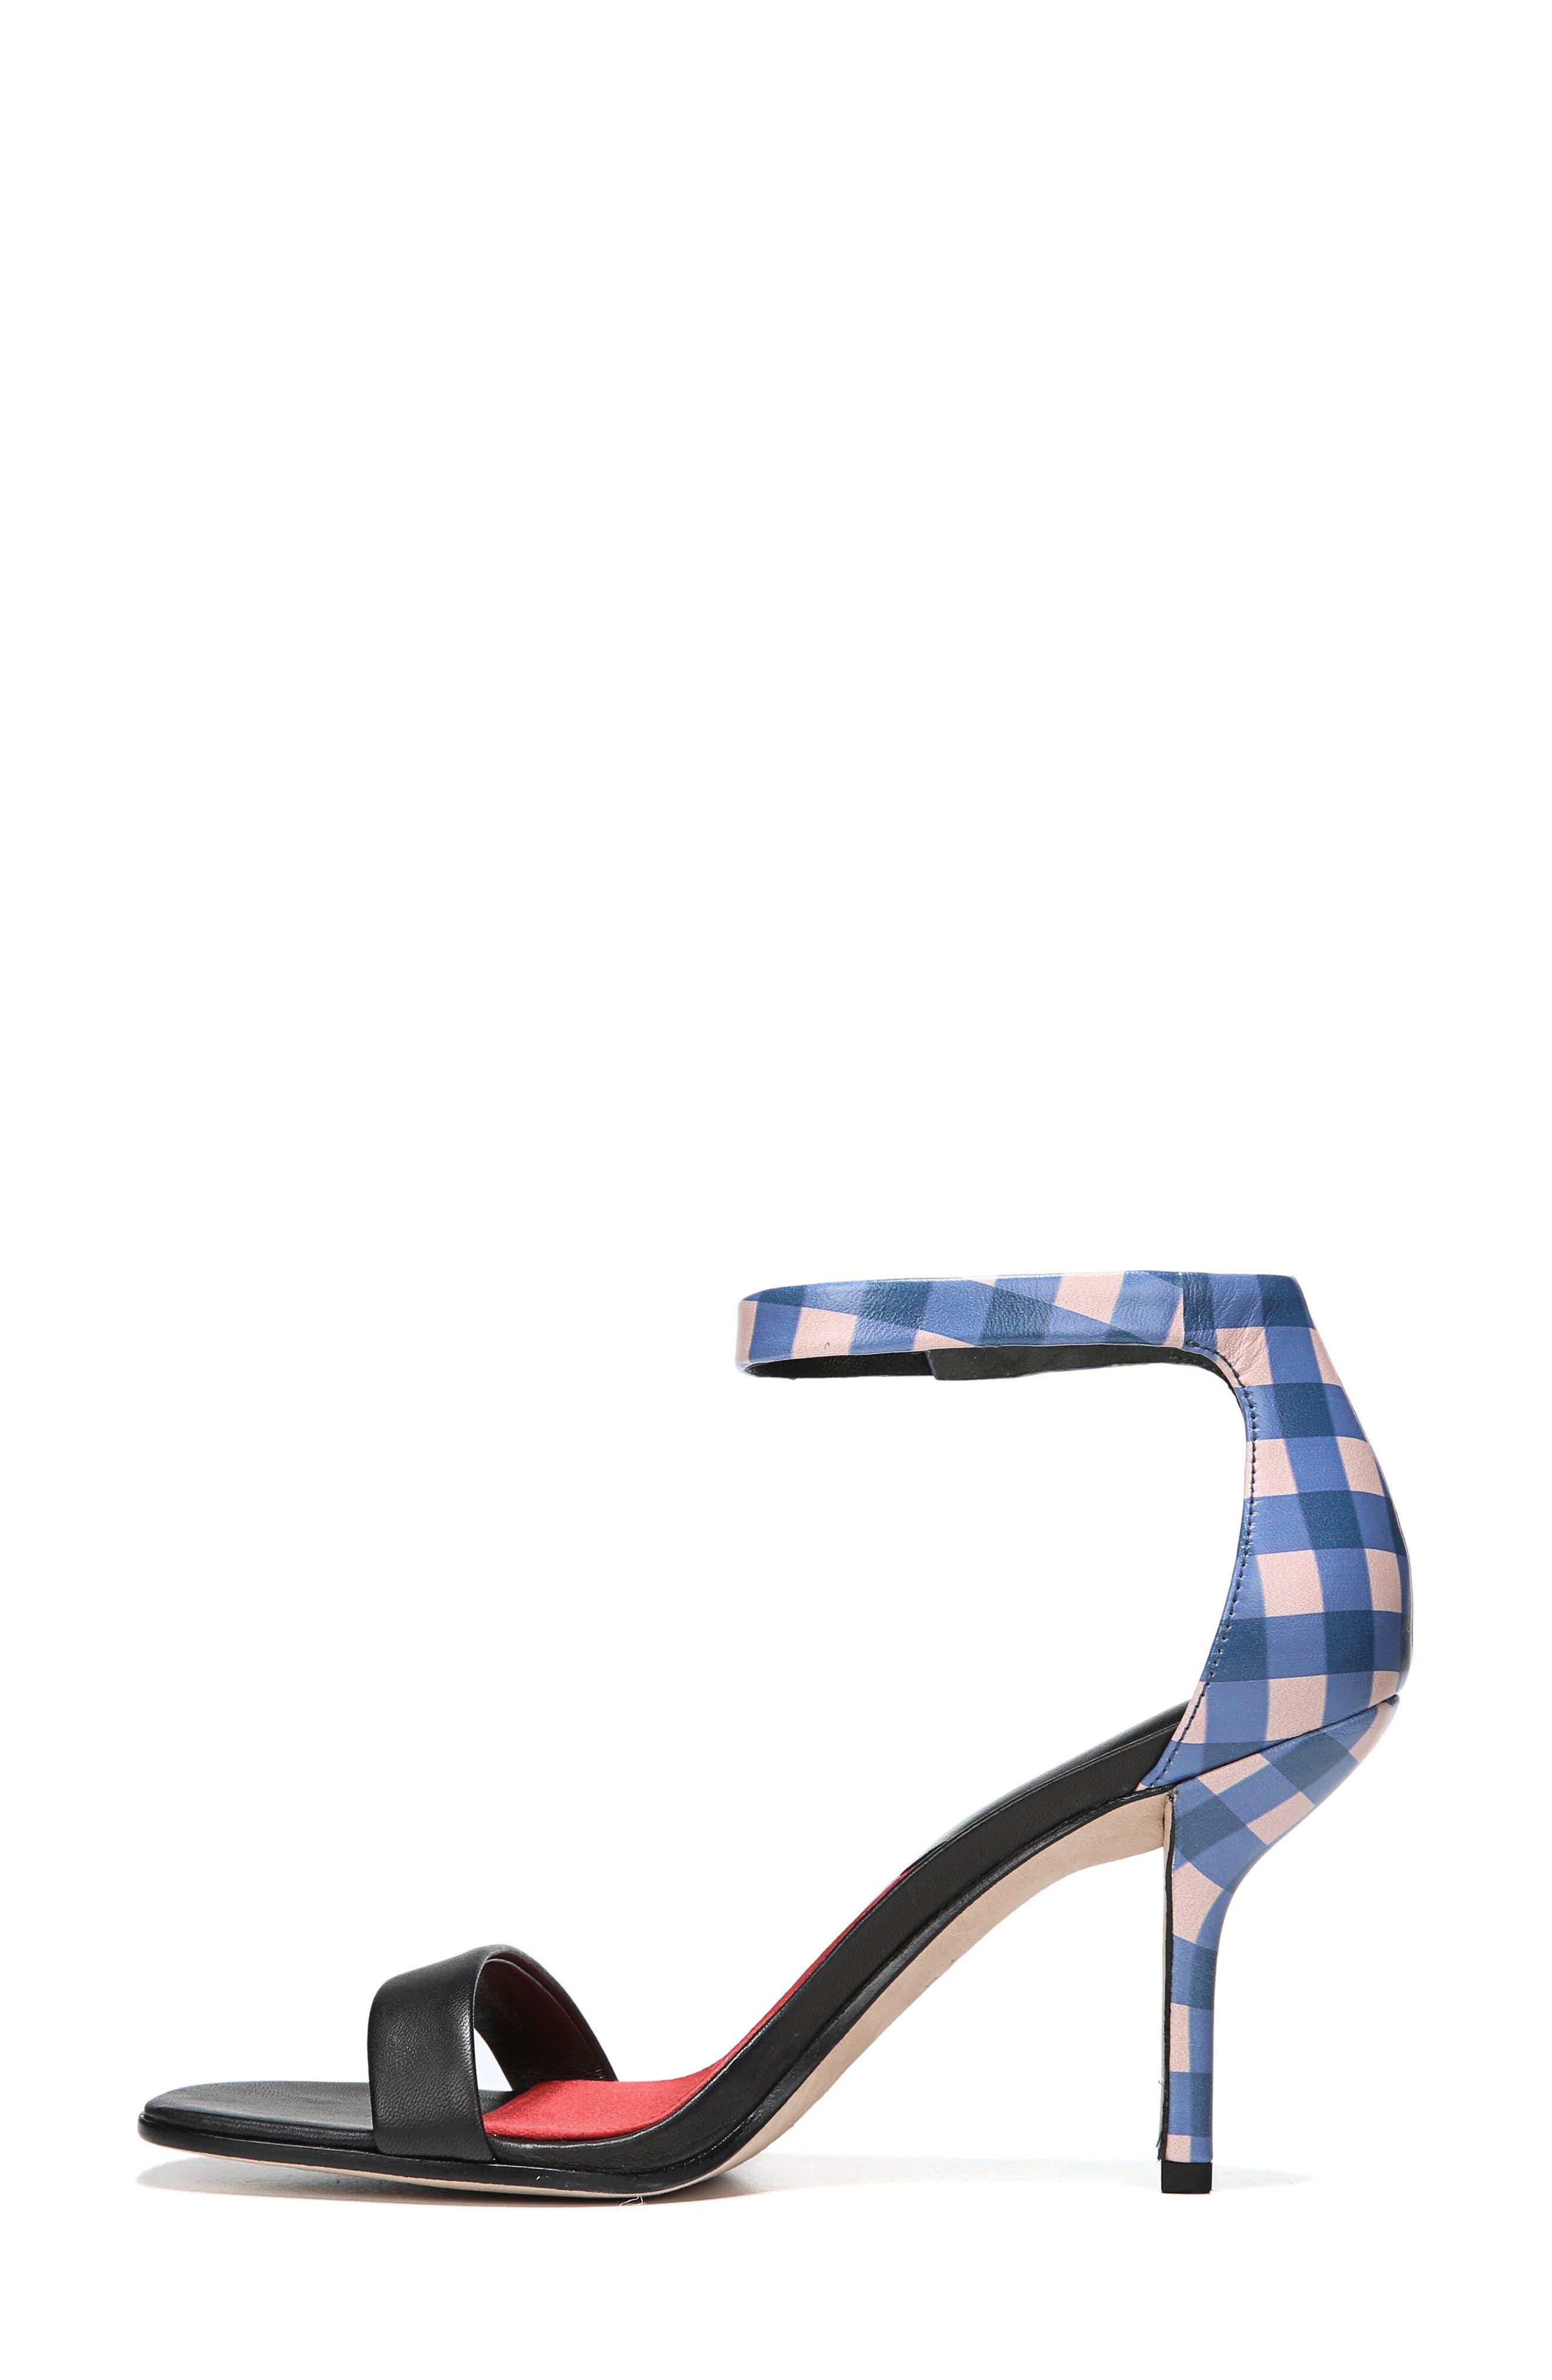 Ferrara Ankle Strap Sandal,                             Alternate thumbnail 3, color,                             001